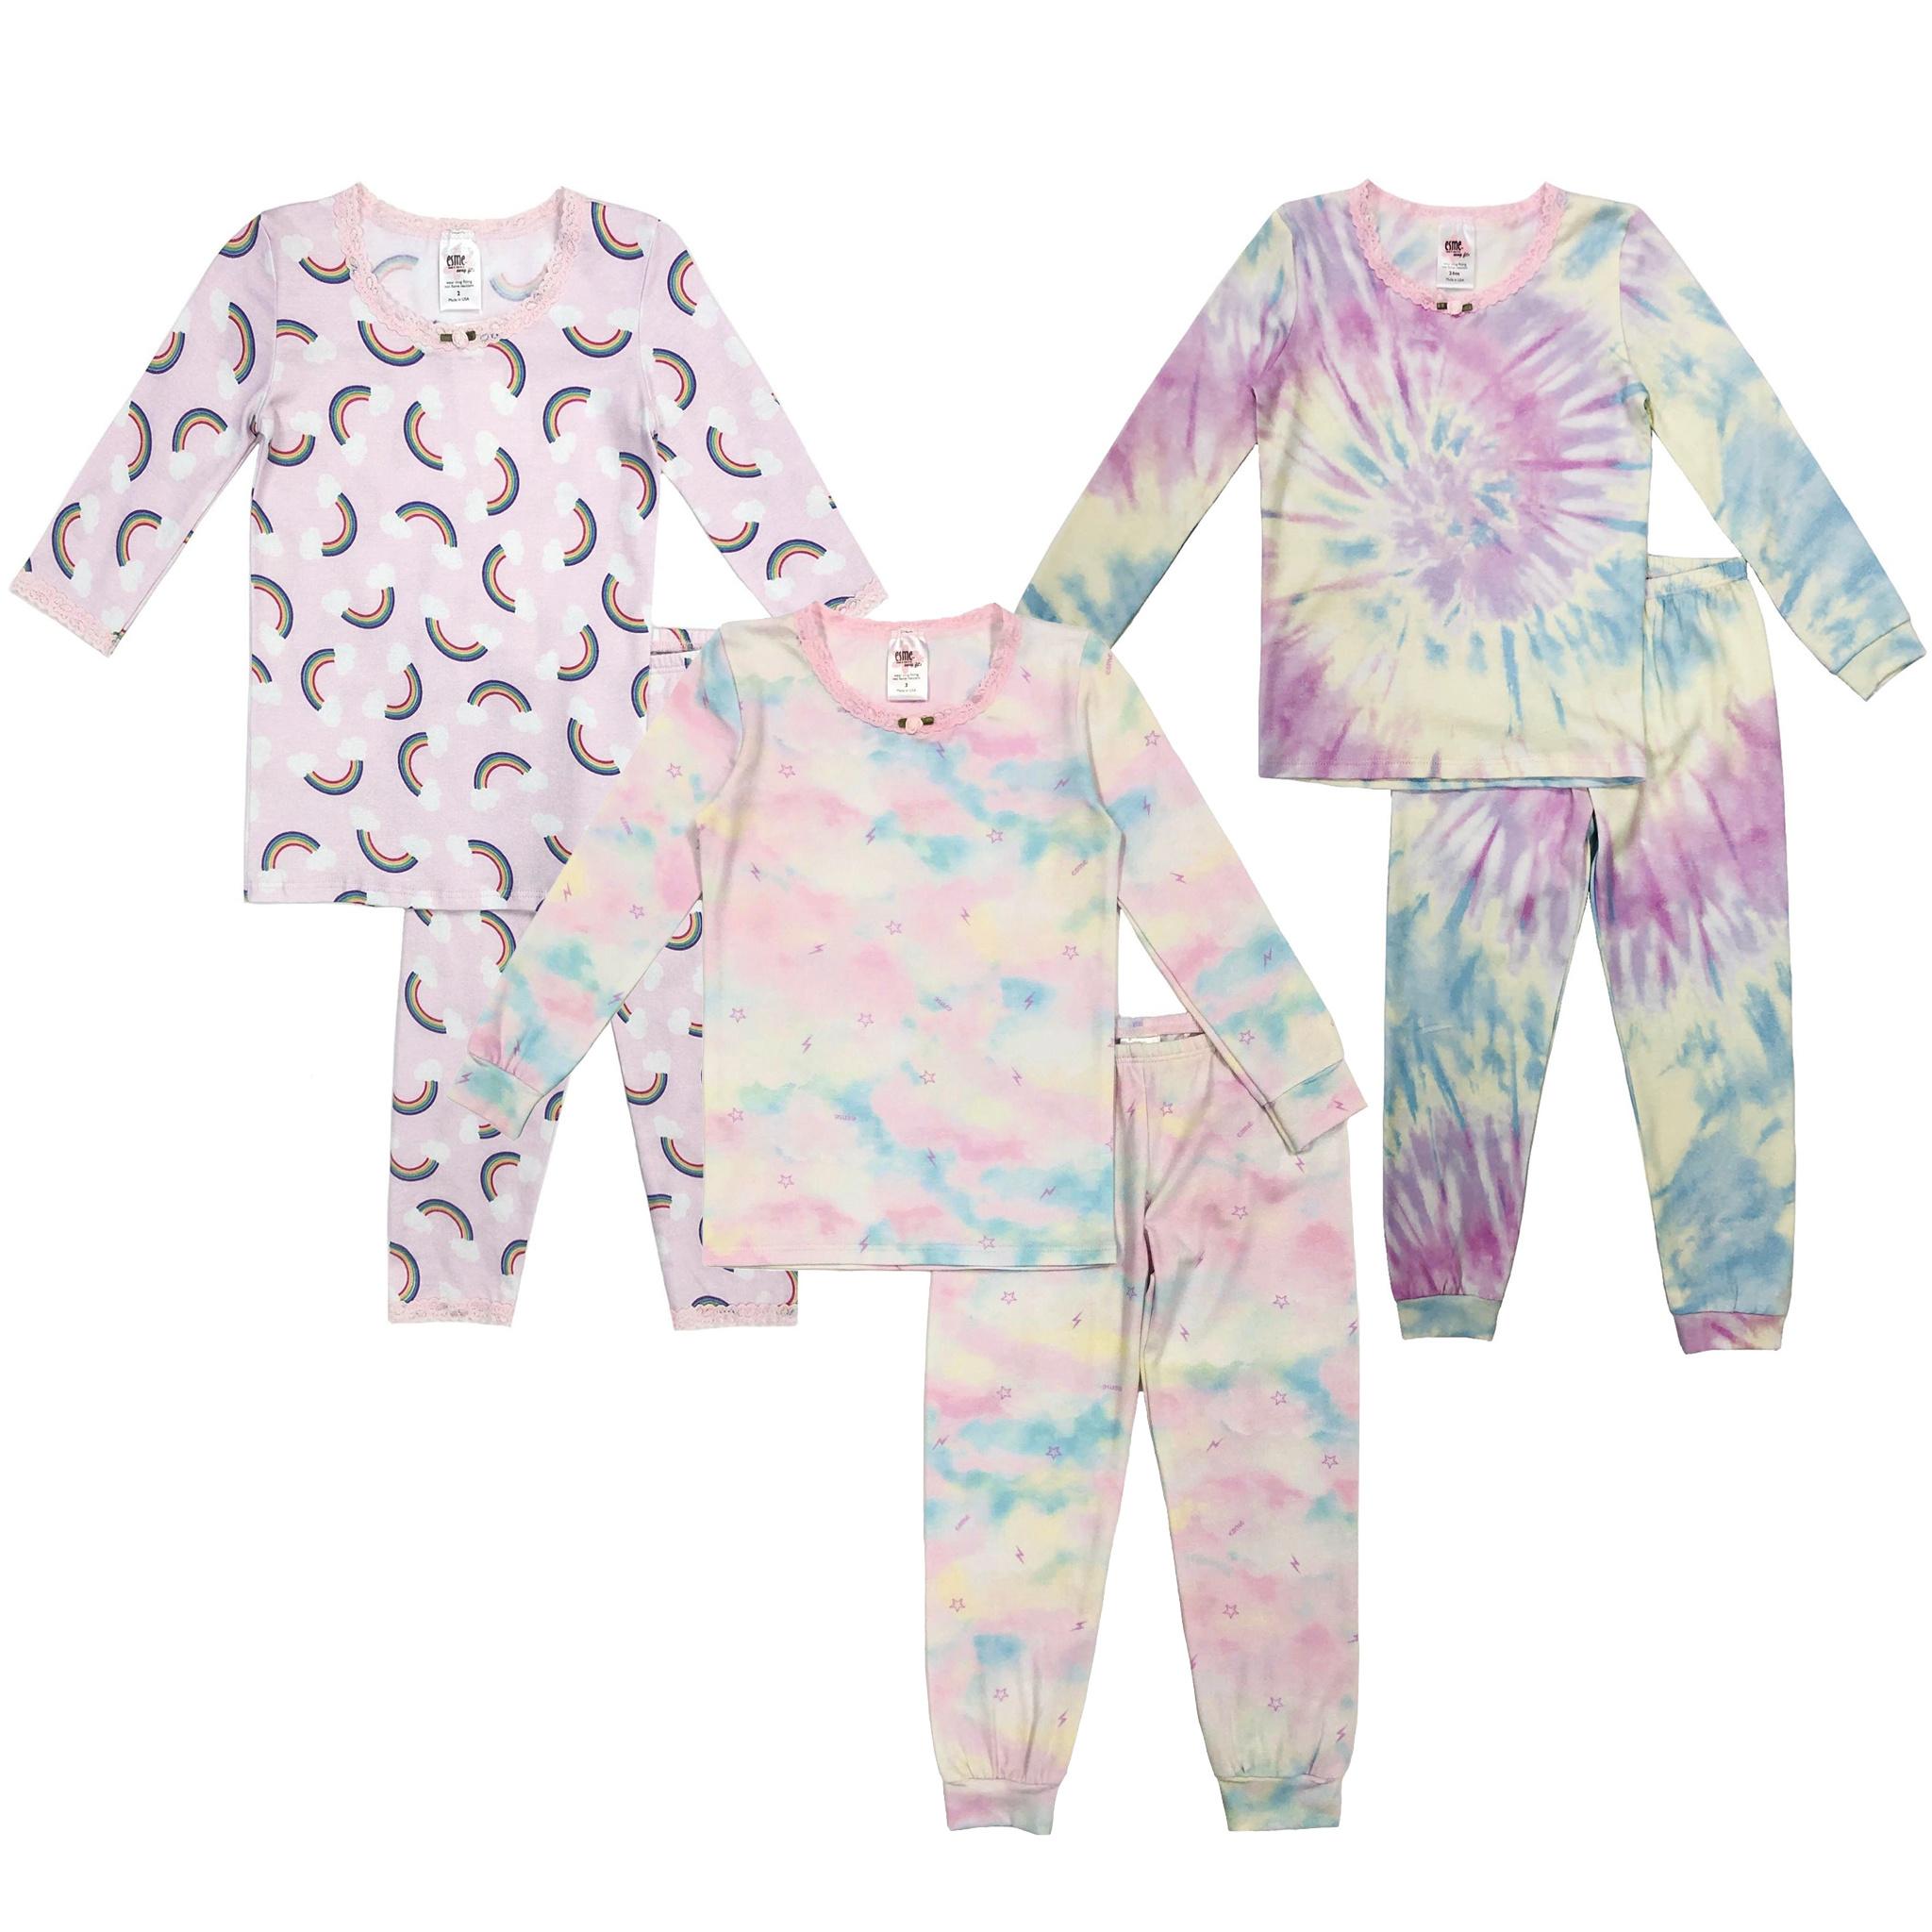 Esme Pajamas Shimmer Collection!